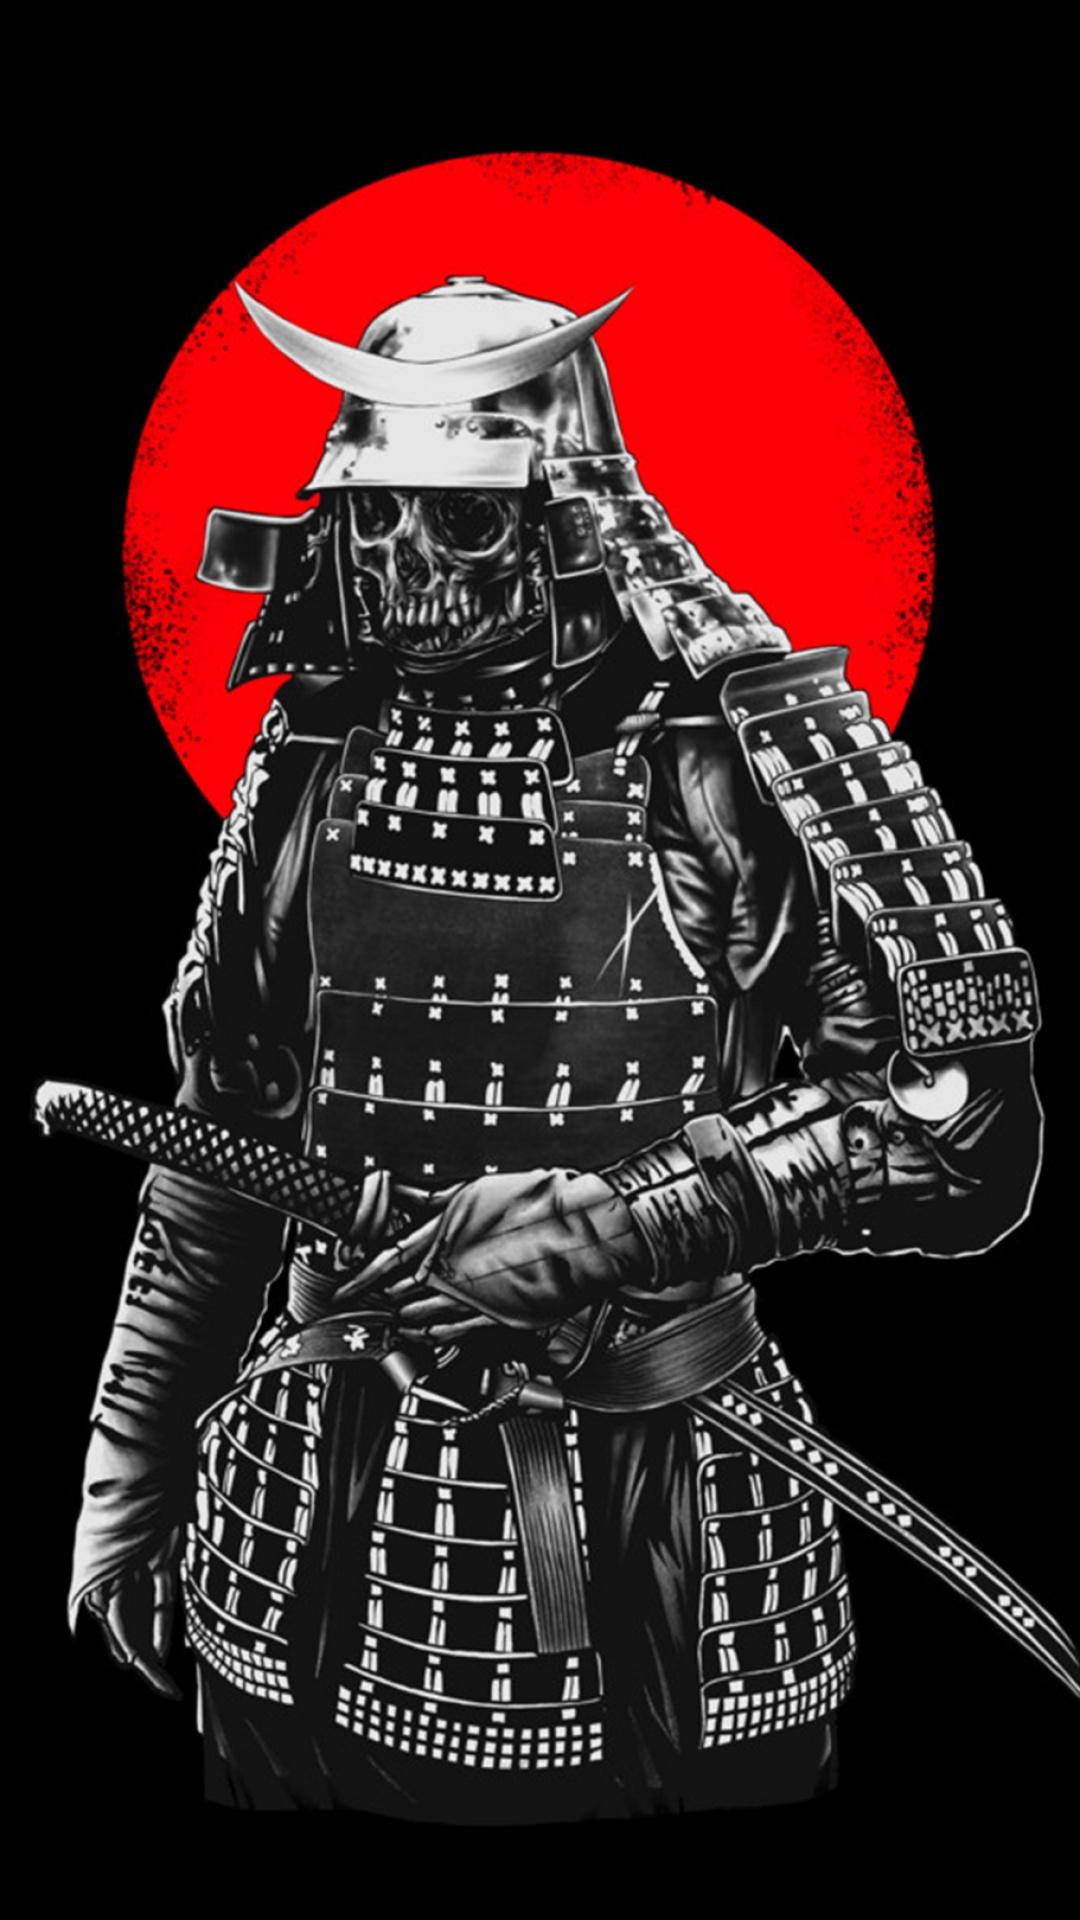 Drawn samurai phone wallpaper Skeleton iPhone ID: Samurai 55592